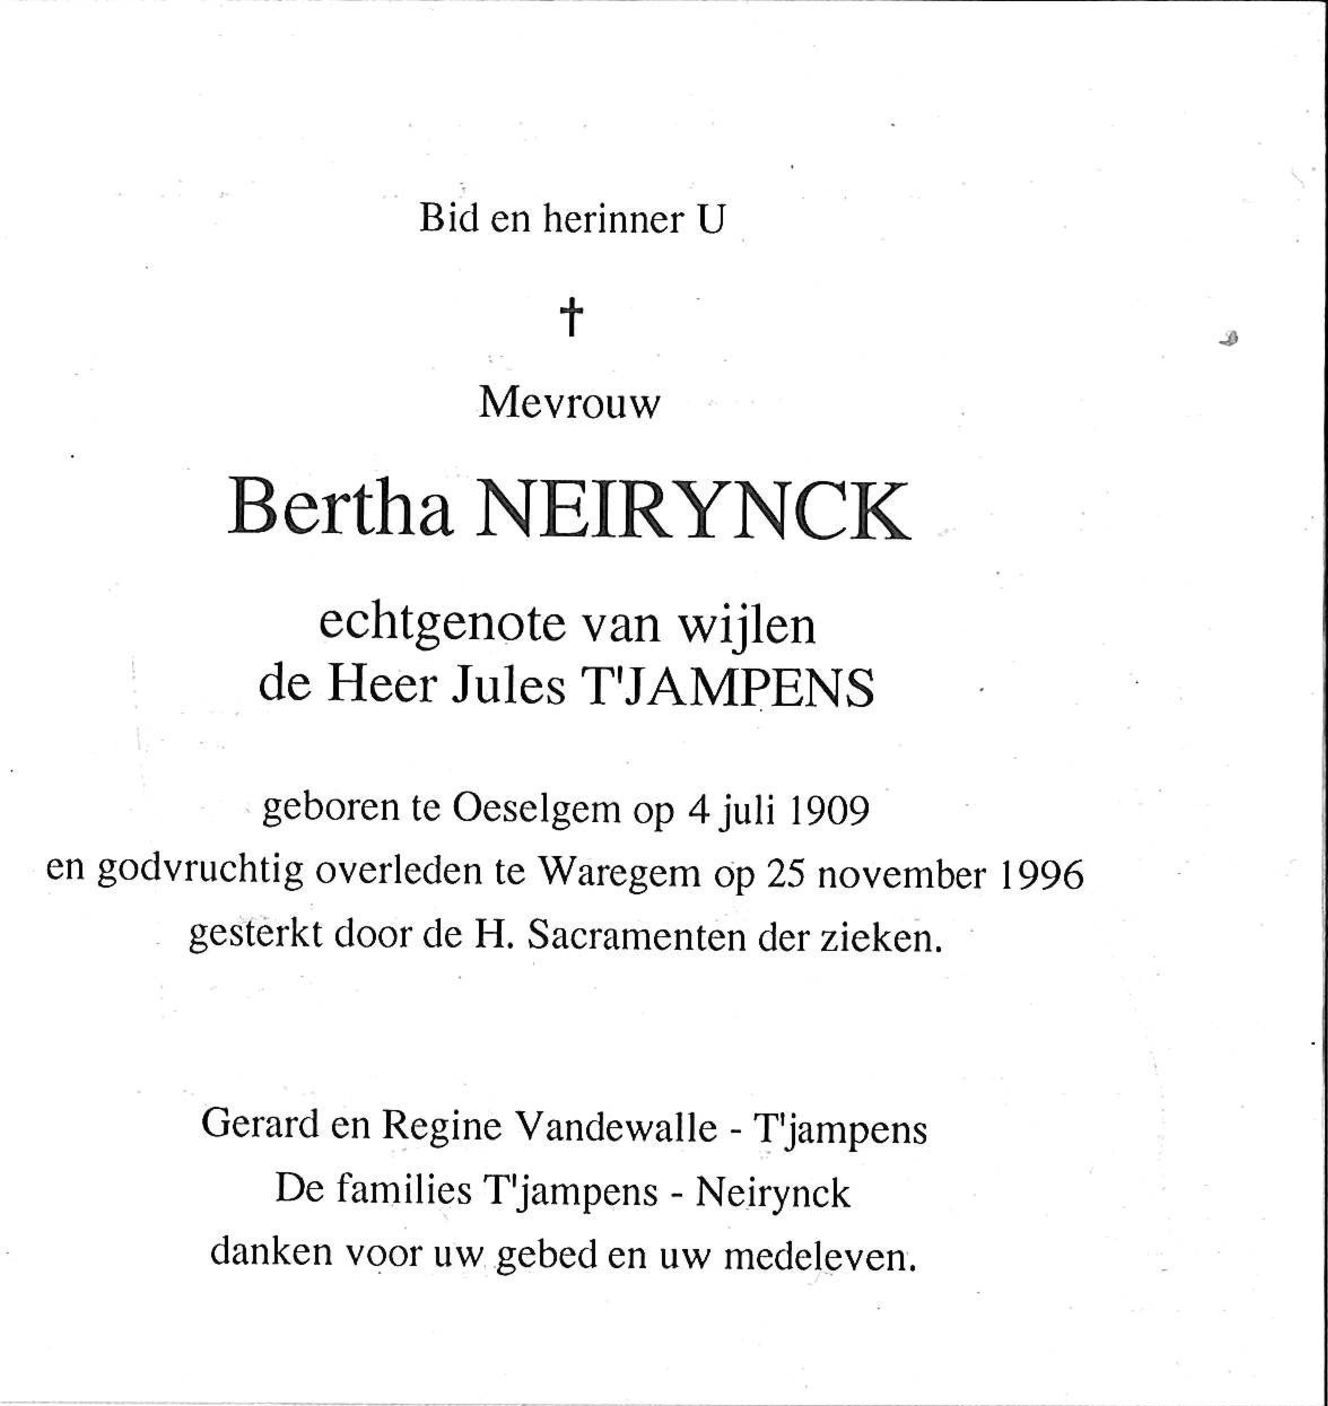 Bertha Neirynck